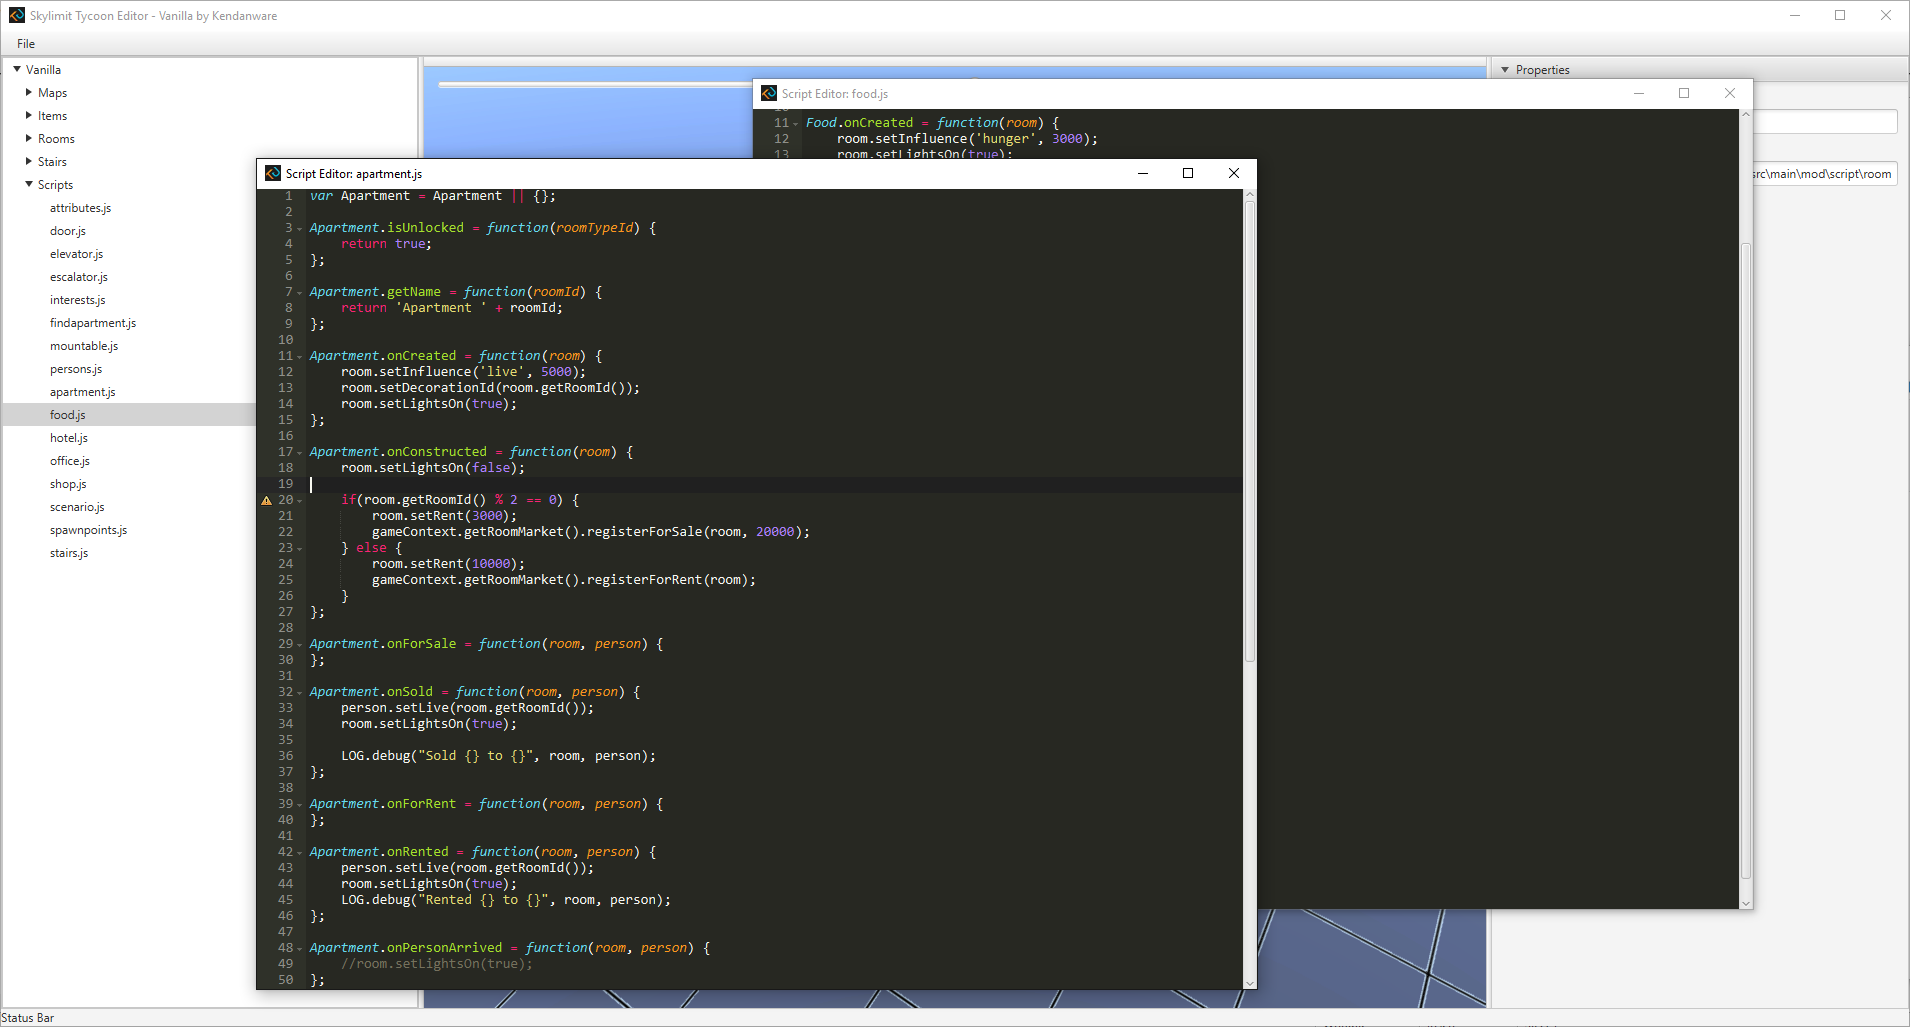 JavaScript highlighting in the mod editor